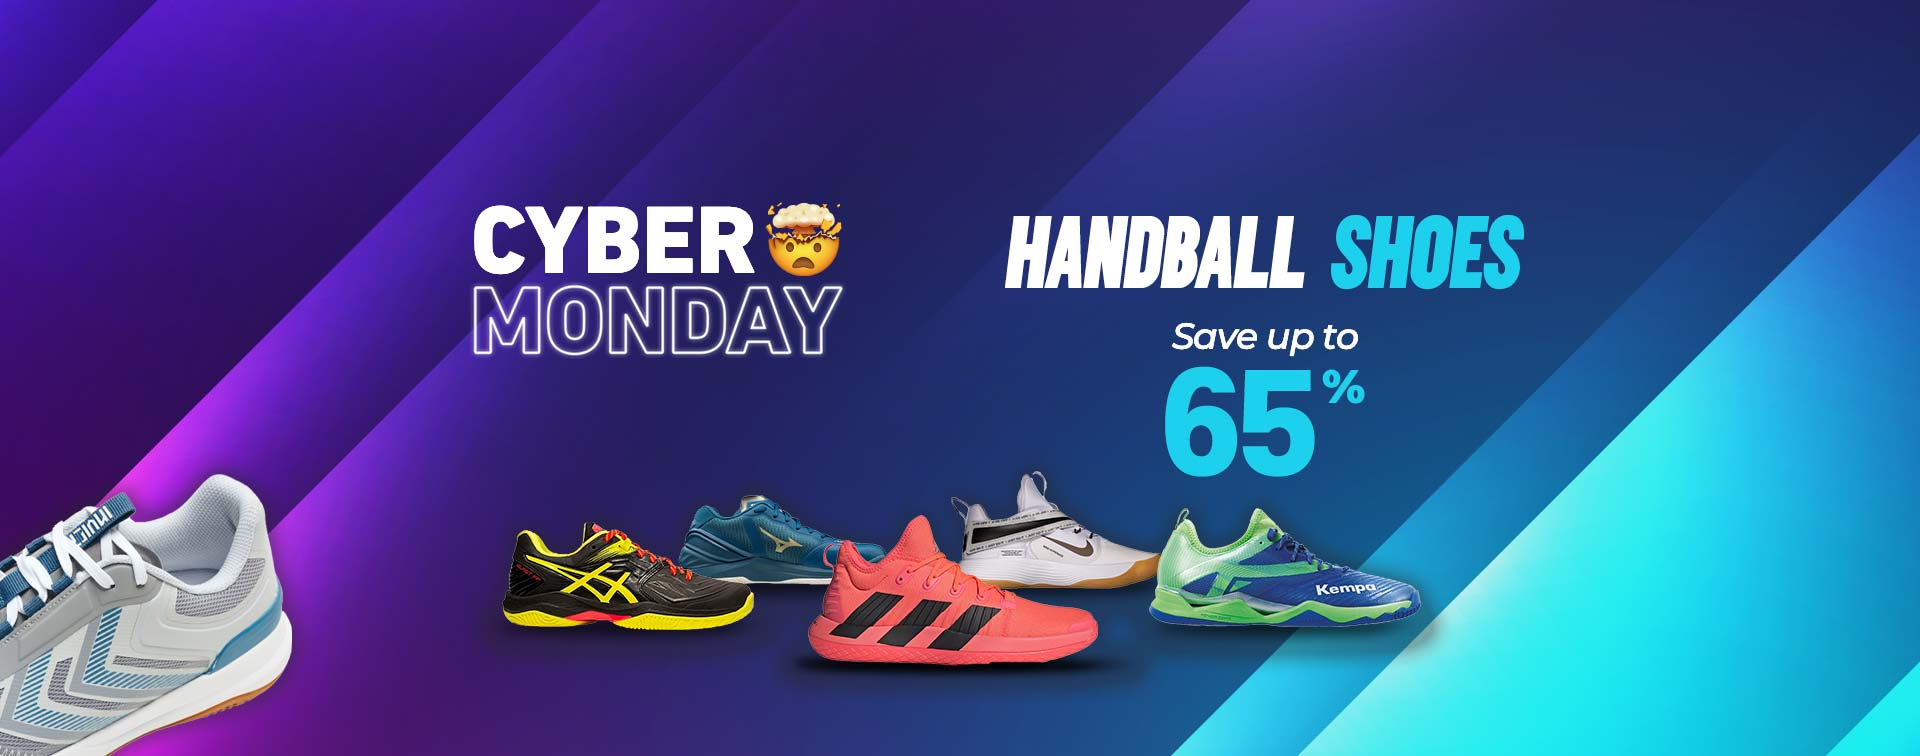 cyber monday handball shoes